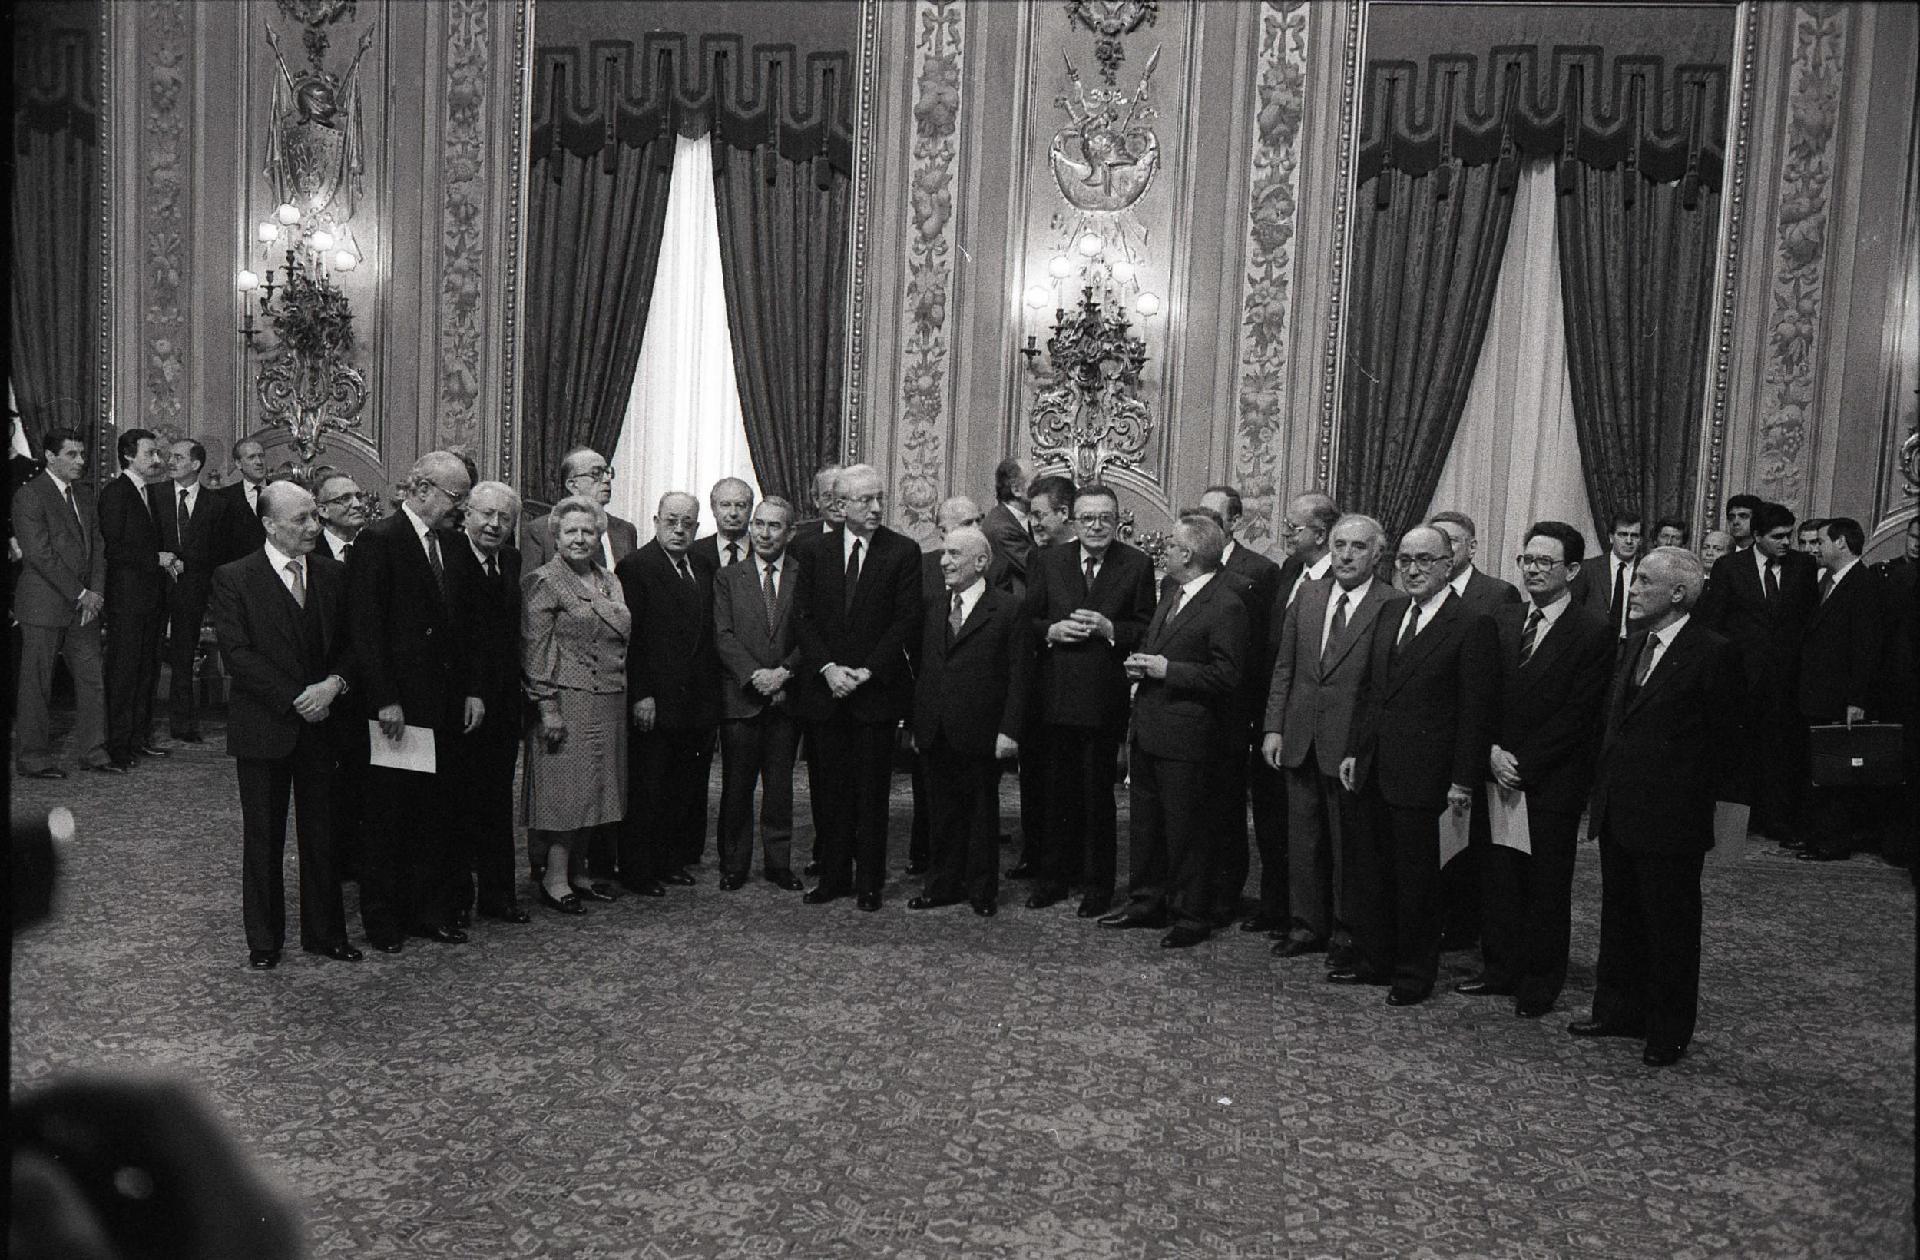 VI Governo Fanfani, 18 aprile 1987